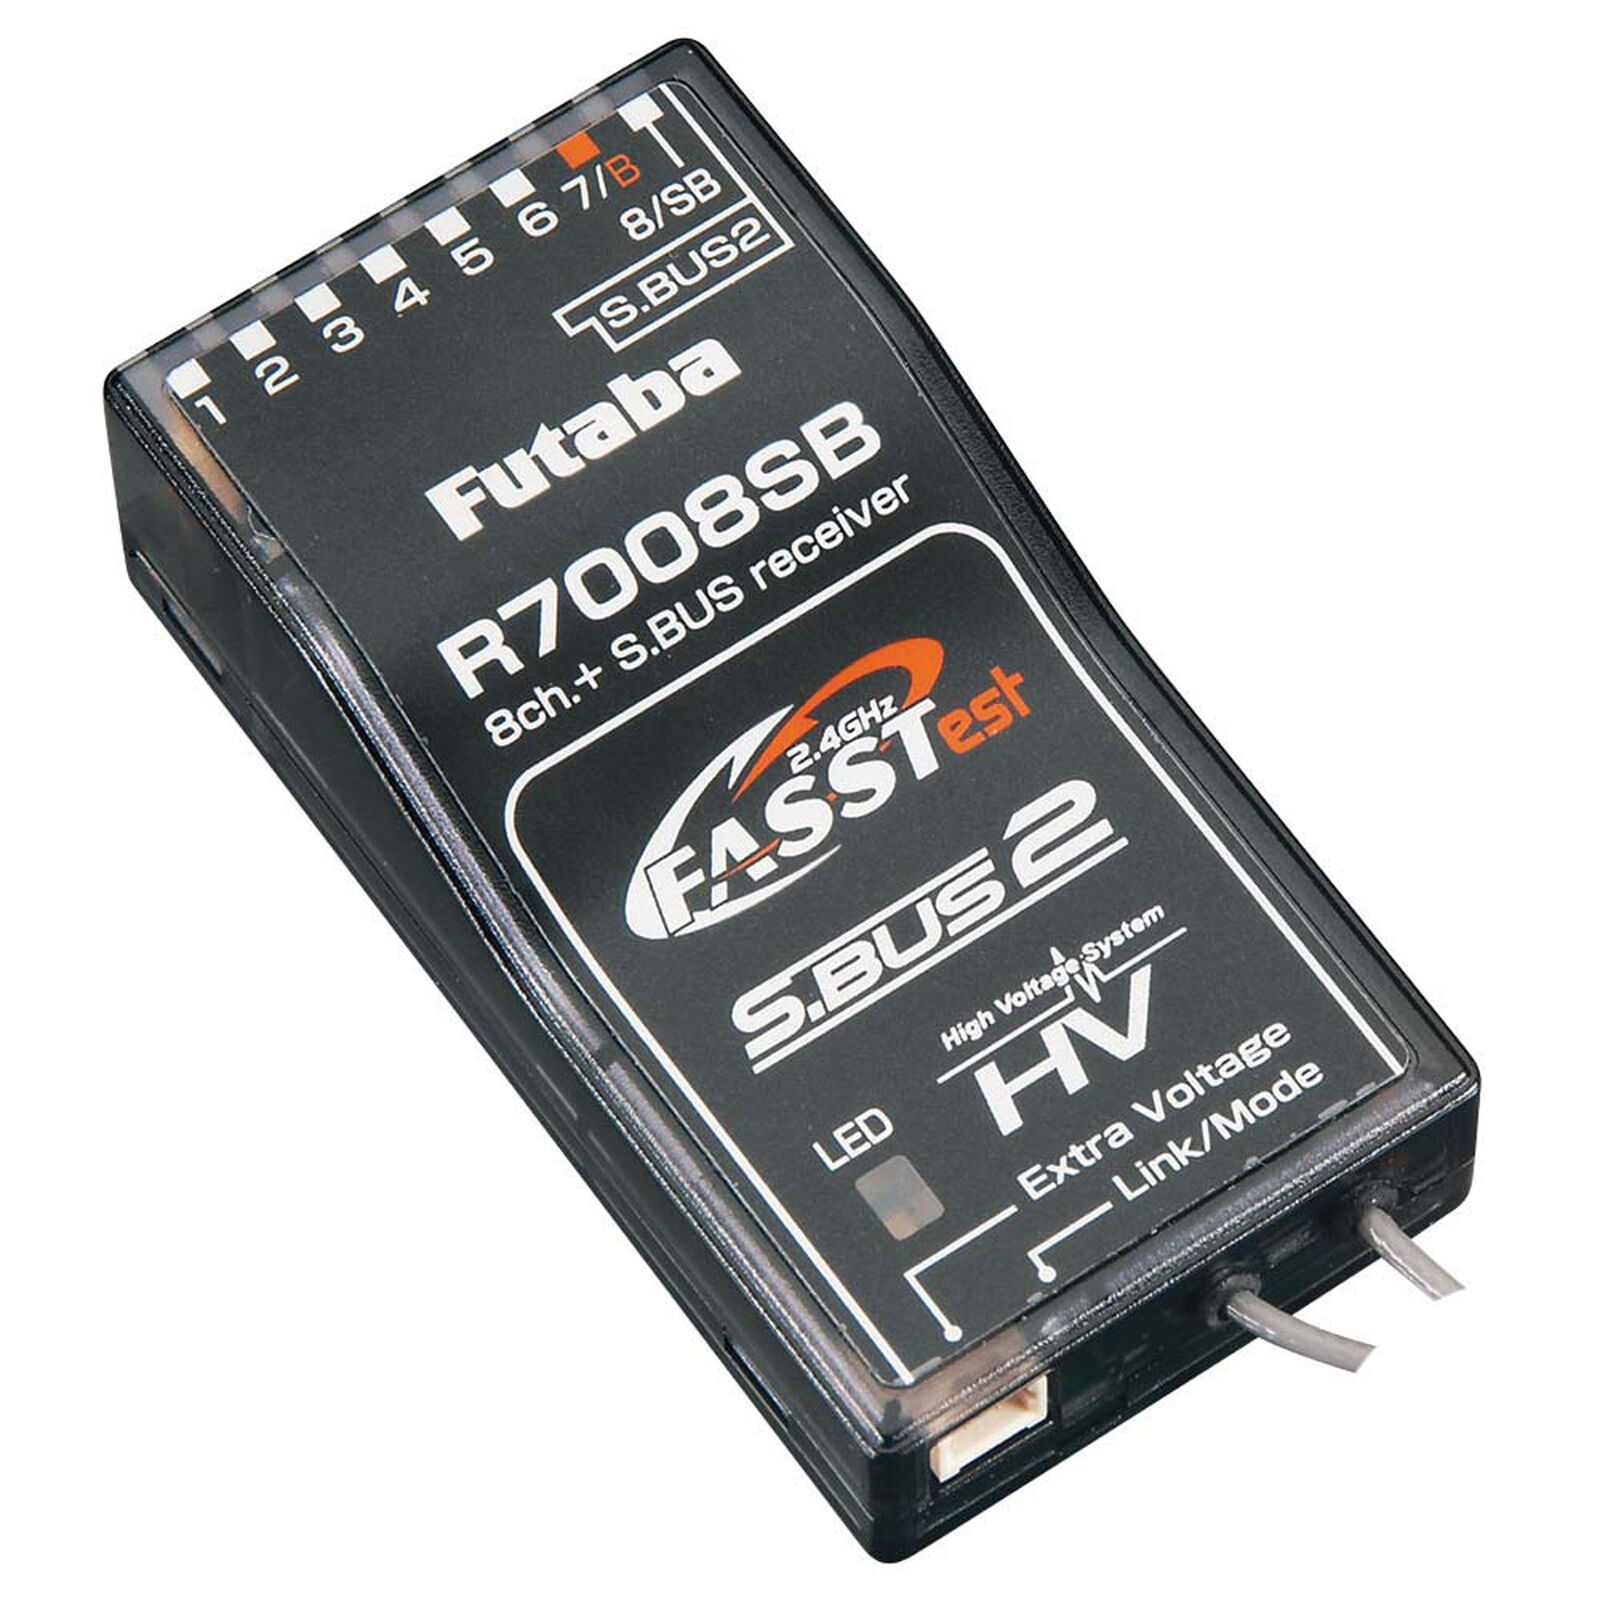 R7008SB S.Bus2 FASSTest Receiver 14SG 18MZ 18SZ